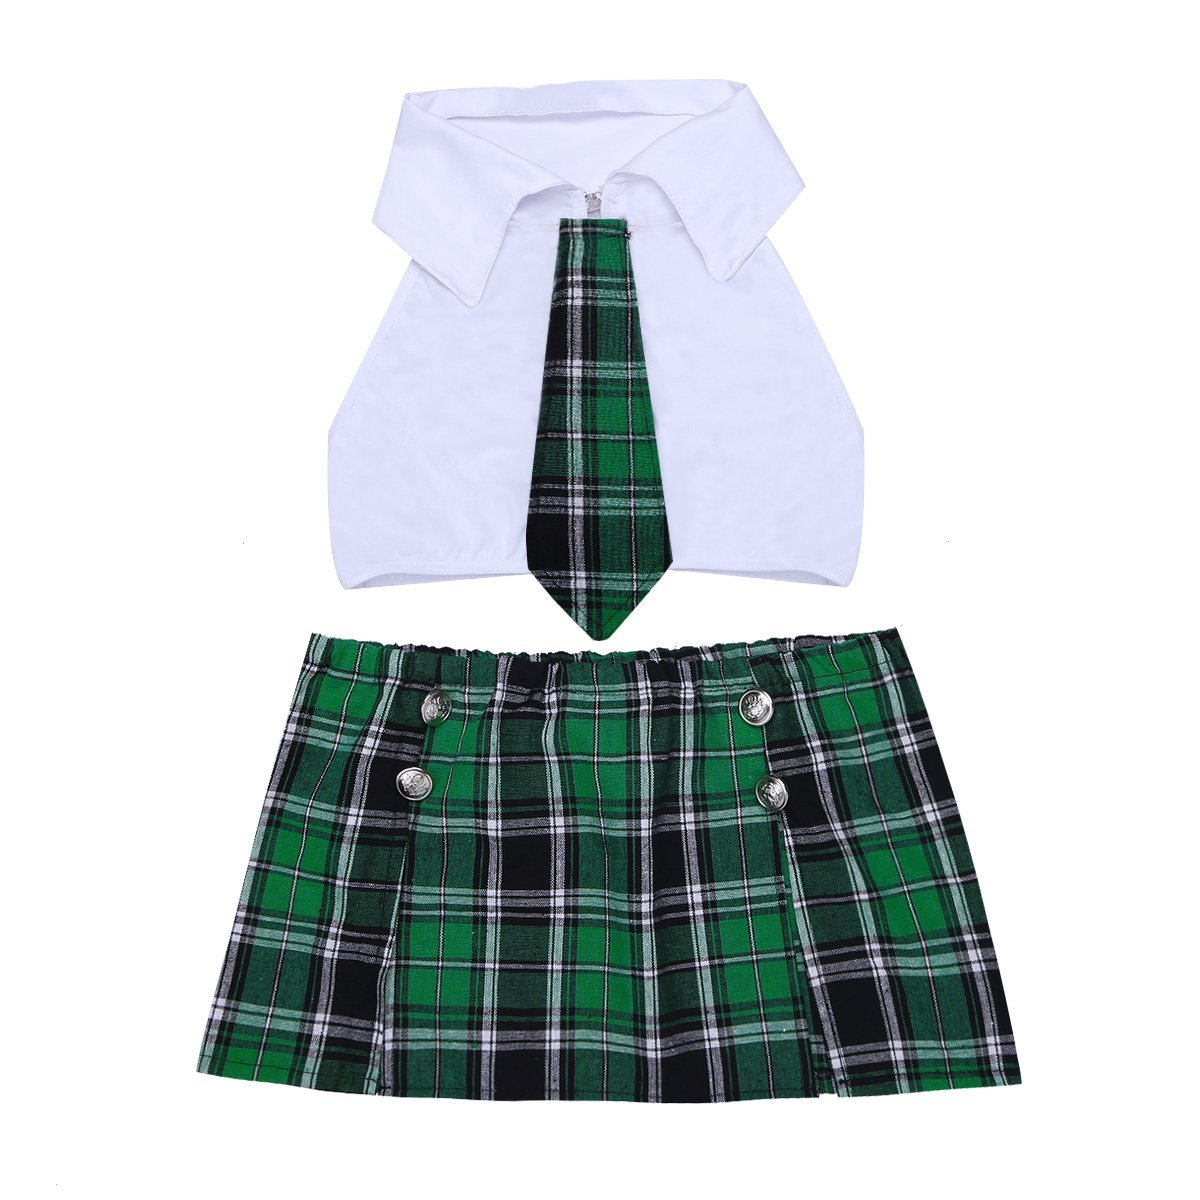 9d8833225c Amazon.com: dPois Womens School Girl Cosplay Fancy Dress Costume Crop Top  with Plaid Mini Skirt Uniform Sets: Clothing